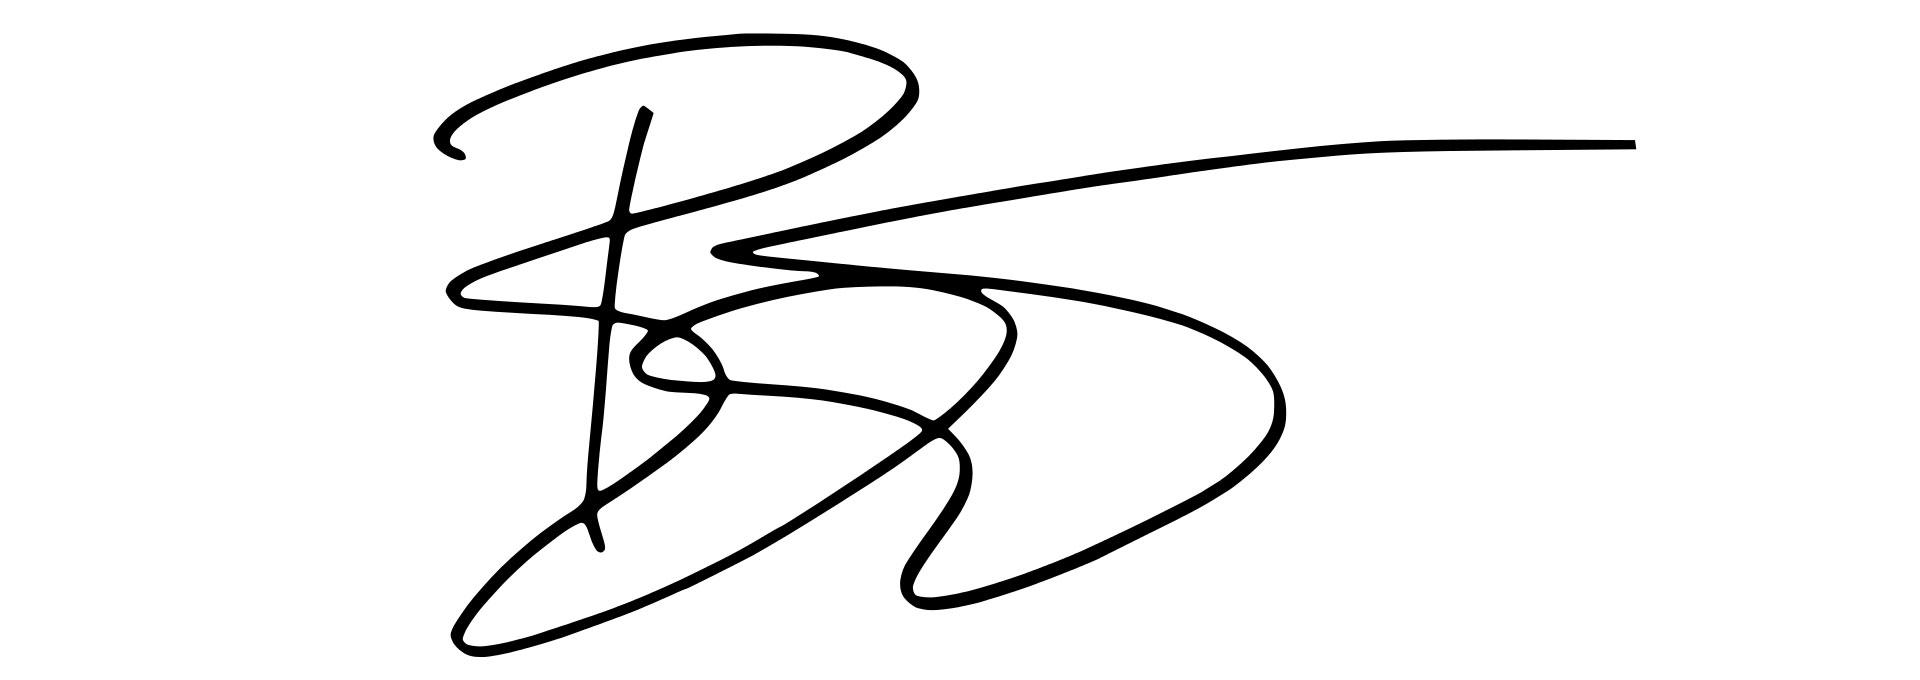 David_Bowie_signature.1920